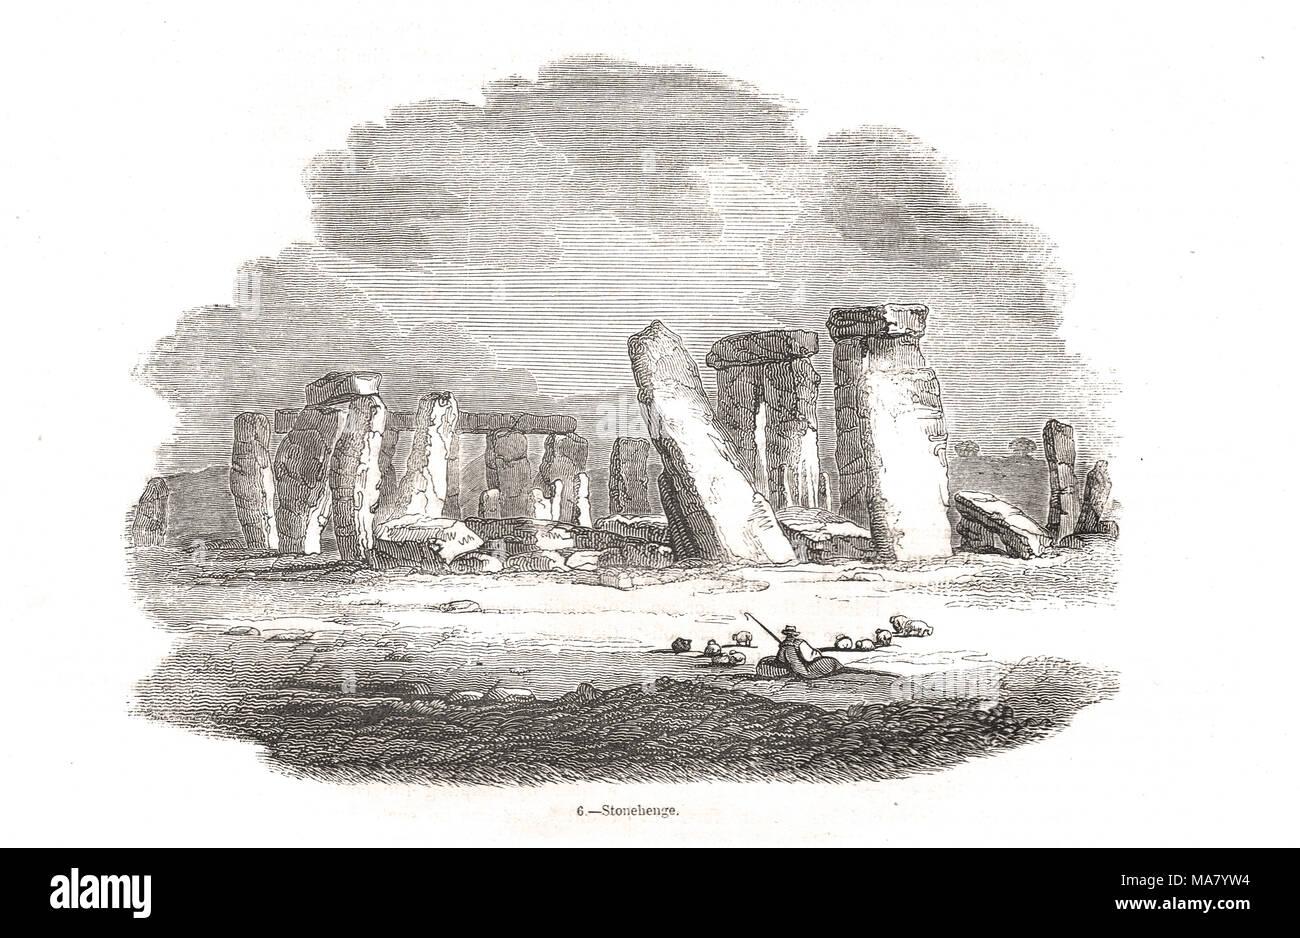 Stonehenge prehistoric monument, Wiltshire, England - Stock Image